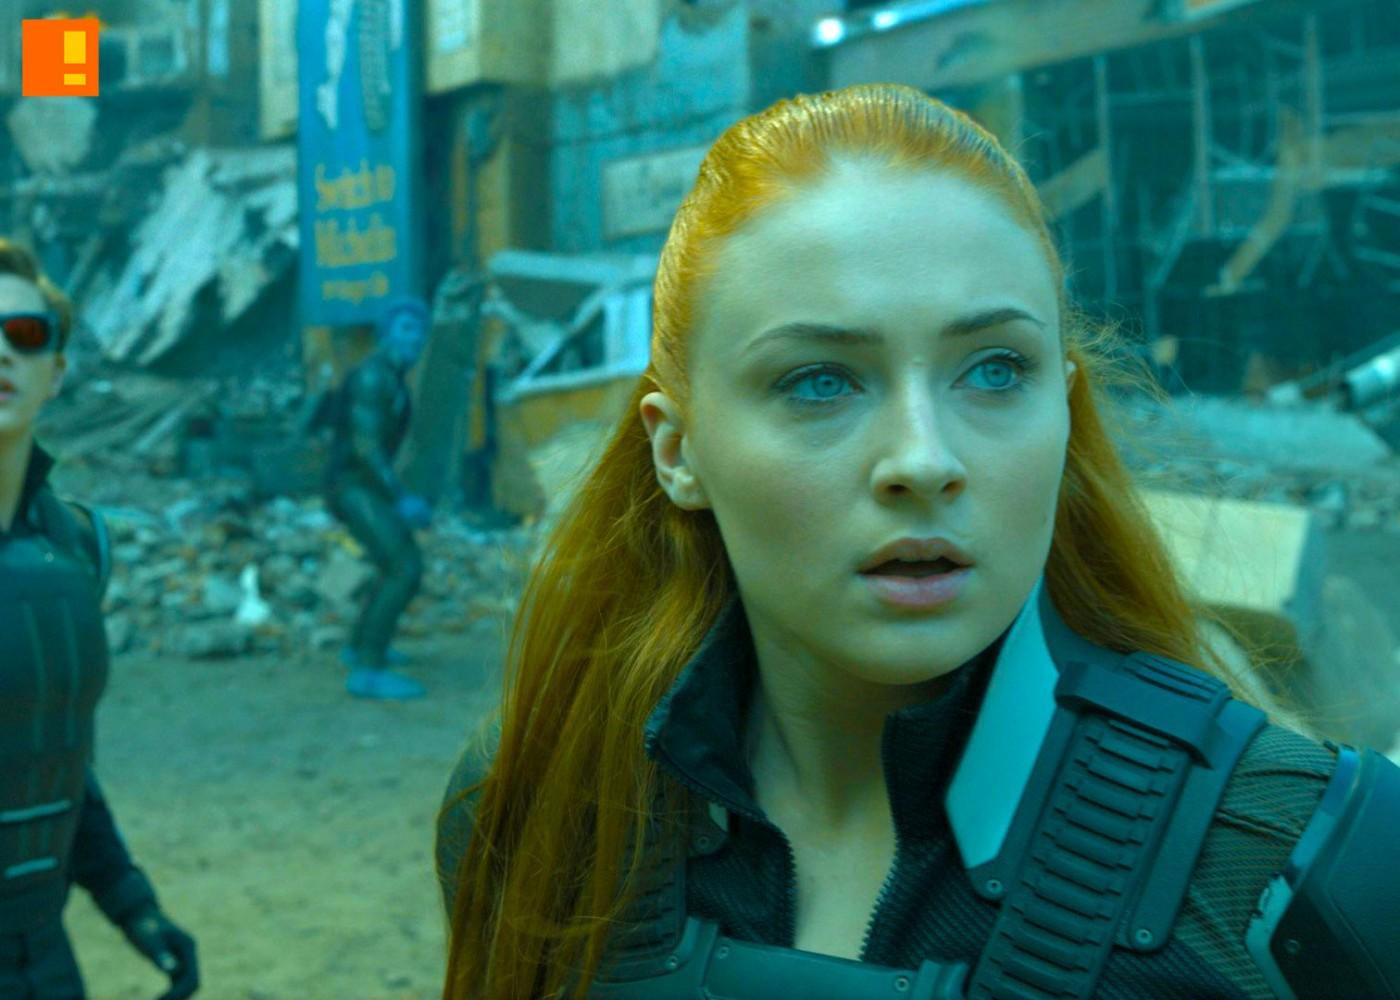 xmen apocalypse Tye Sheridan as Cyclops and Sophie Turner as Jean Grey